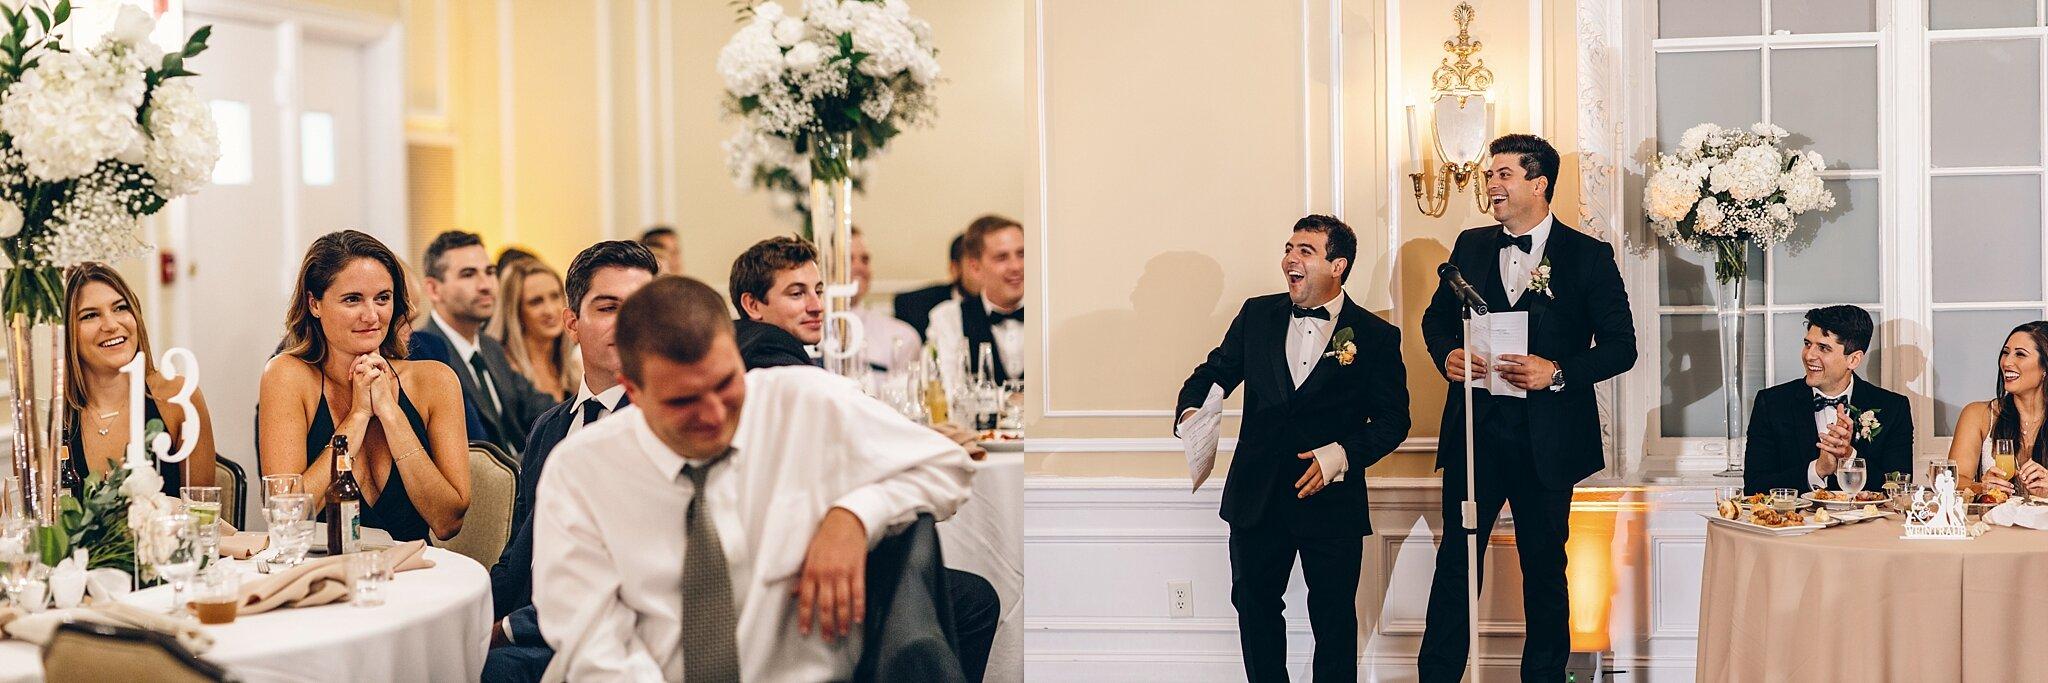 patrick-henry-ballroom-wedding-roanoke_0536.jpg